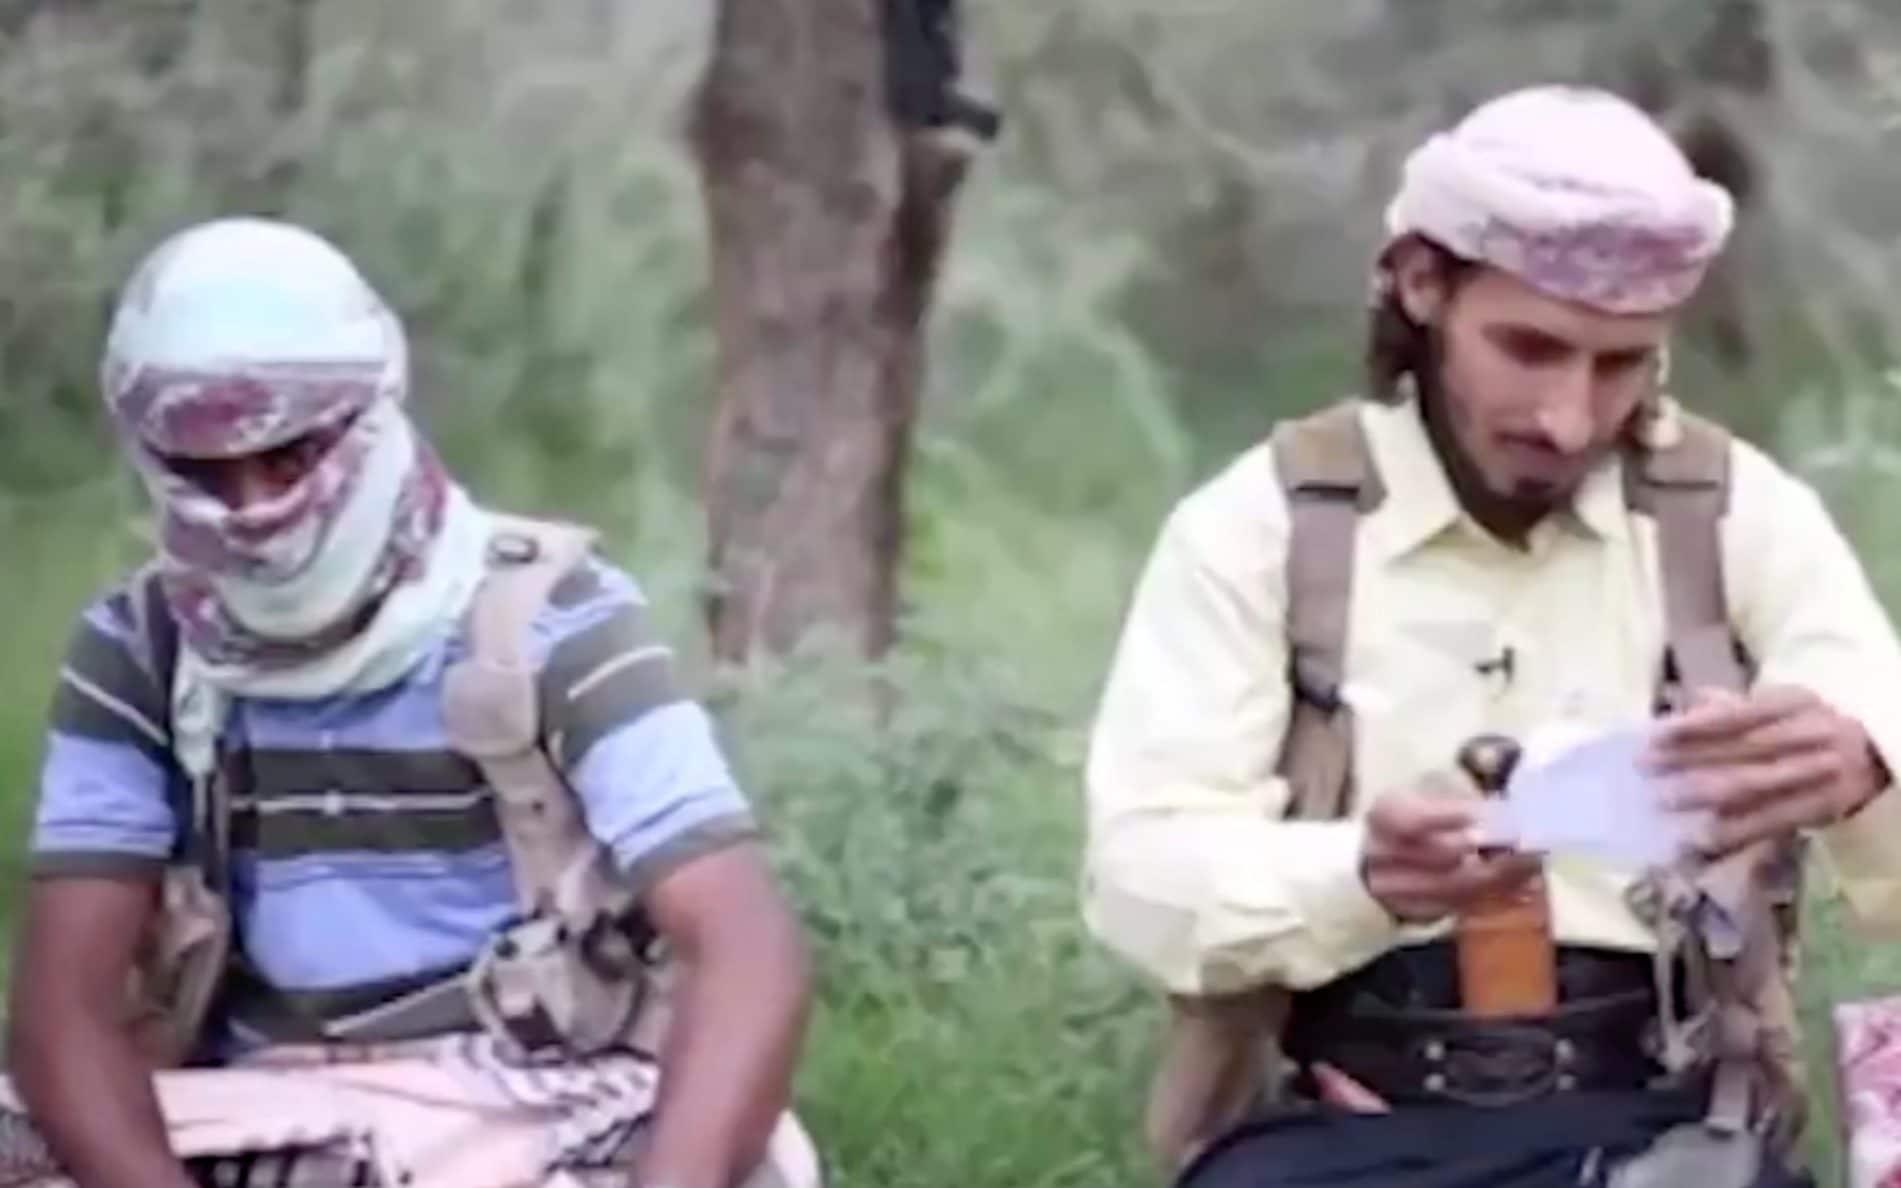 Al Qaeda releases blooper reel of Islamic State videos amid jihadi spat